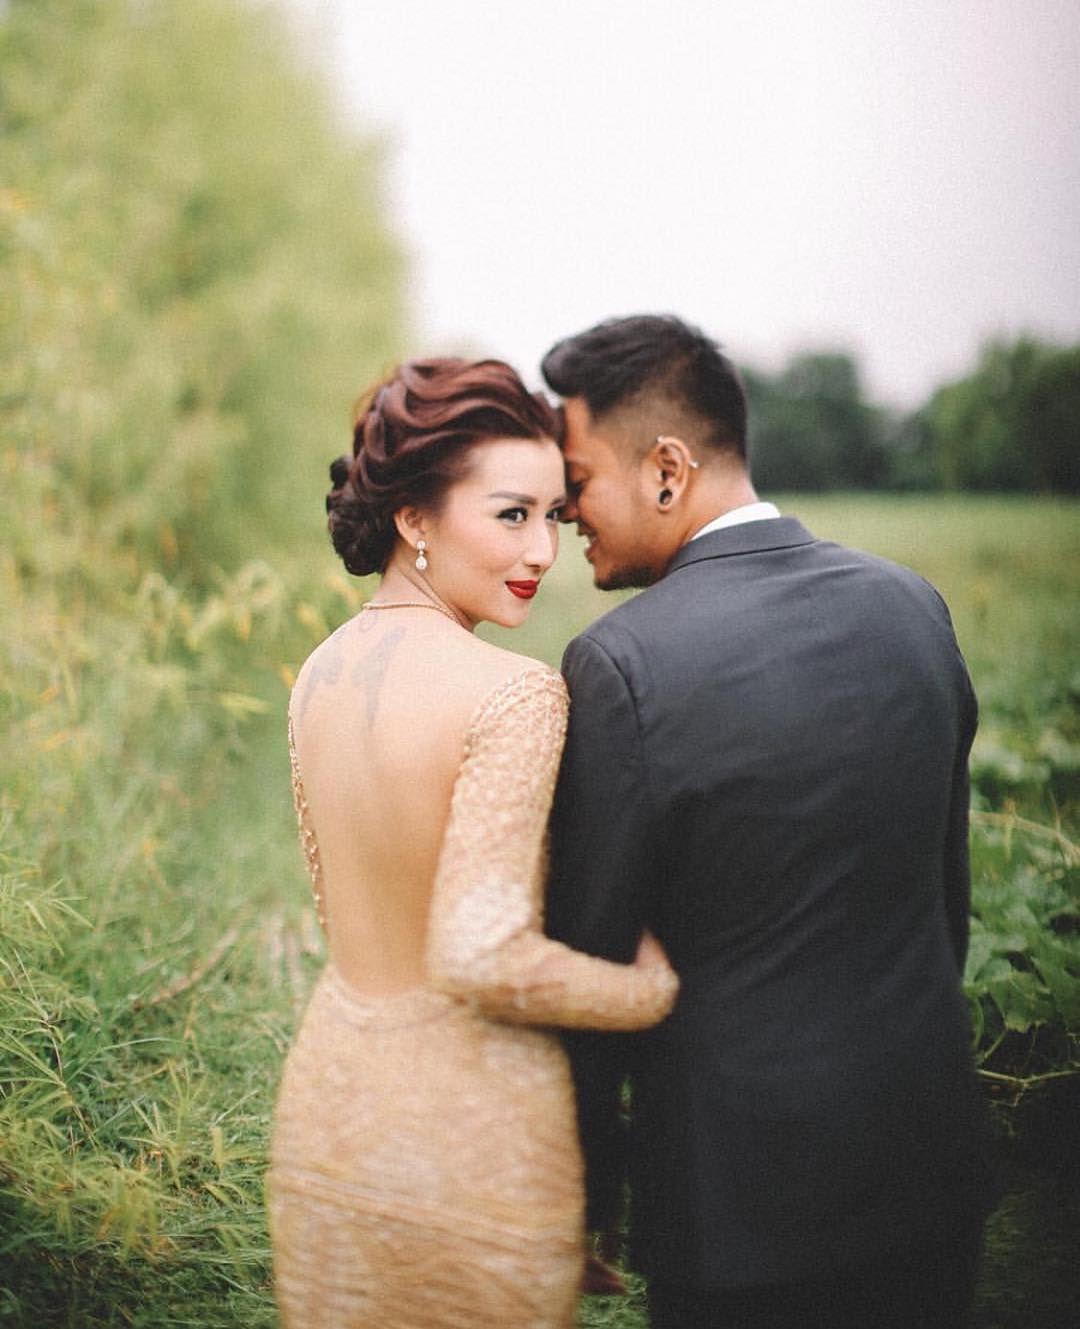 It's you, it's always been you... Beautiful Bride: @malvala  Handsome Groom: @anggabooth Photographers: @evansirawan @pyaraphoto Make up & Hair: @donnyliem Wedding Dress: @fififirianty  #danielalicewedding#beautifulvows#baliwedding#balievent#baliphotographer#balimua#weddingdreams#beautifulwedding#bridaldreams#bridalinspiration#asianwedding#pyaraphoto#mua#balibible#beautifulbali#weddingdreams#bridalinspiration#weddinginspiration#weddingdress#goldweddingdress#wedmegood#bridaldreams